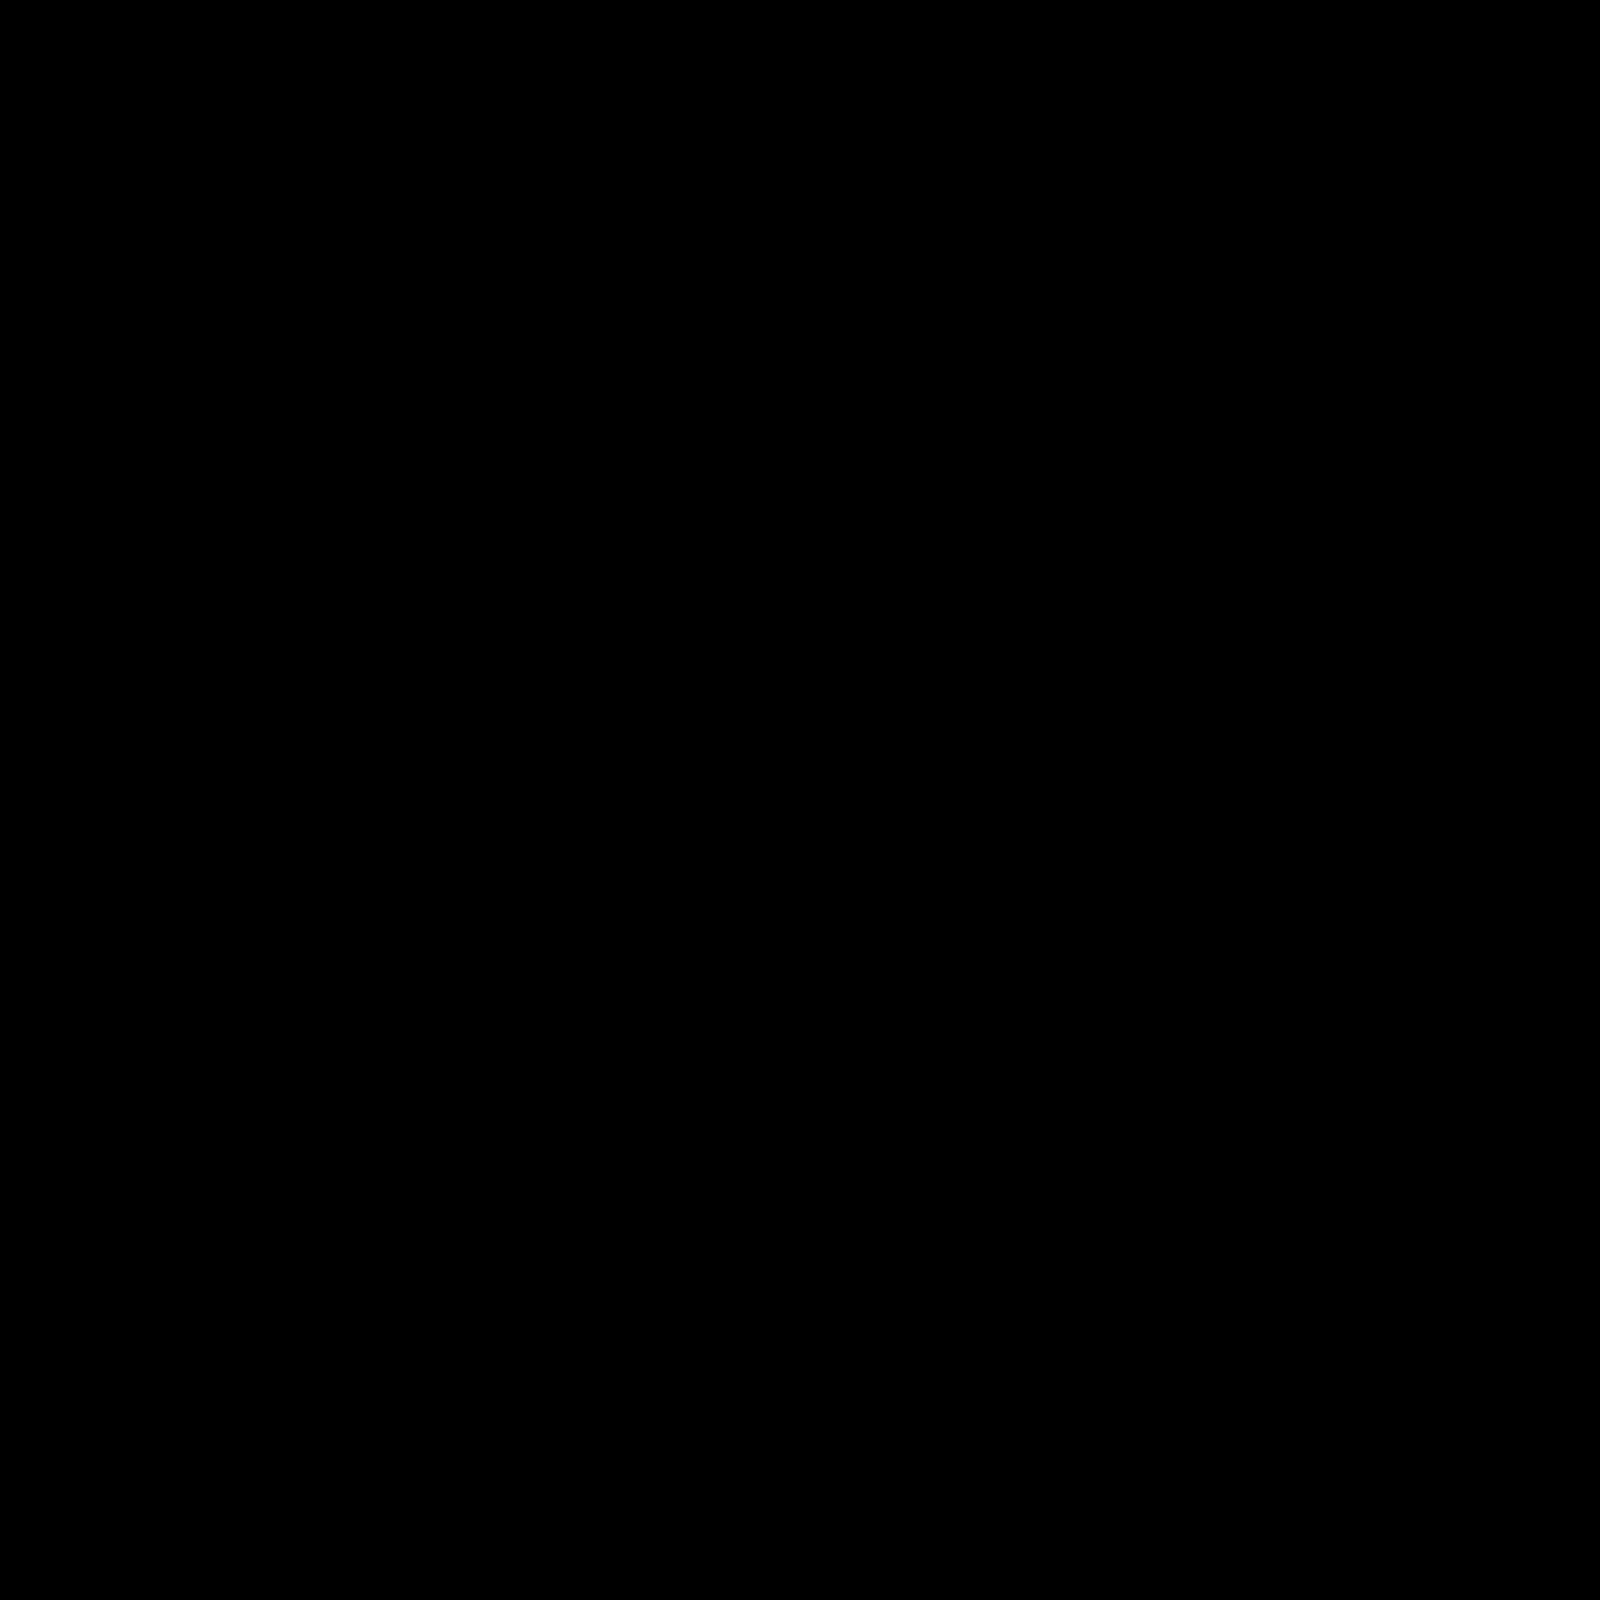 Female Meeting icon